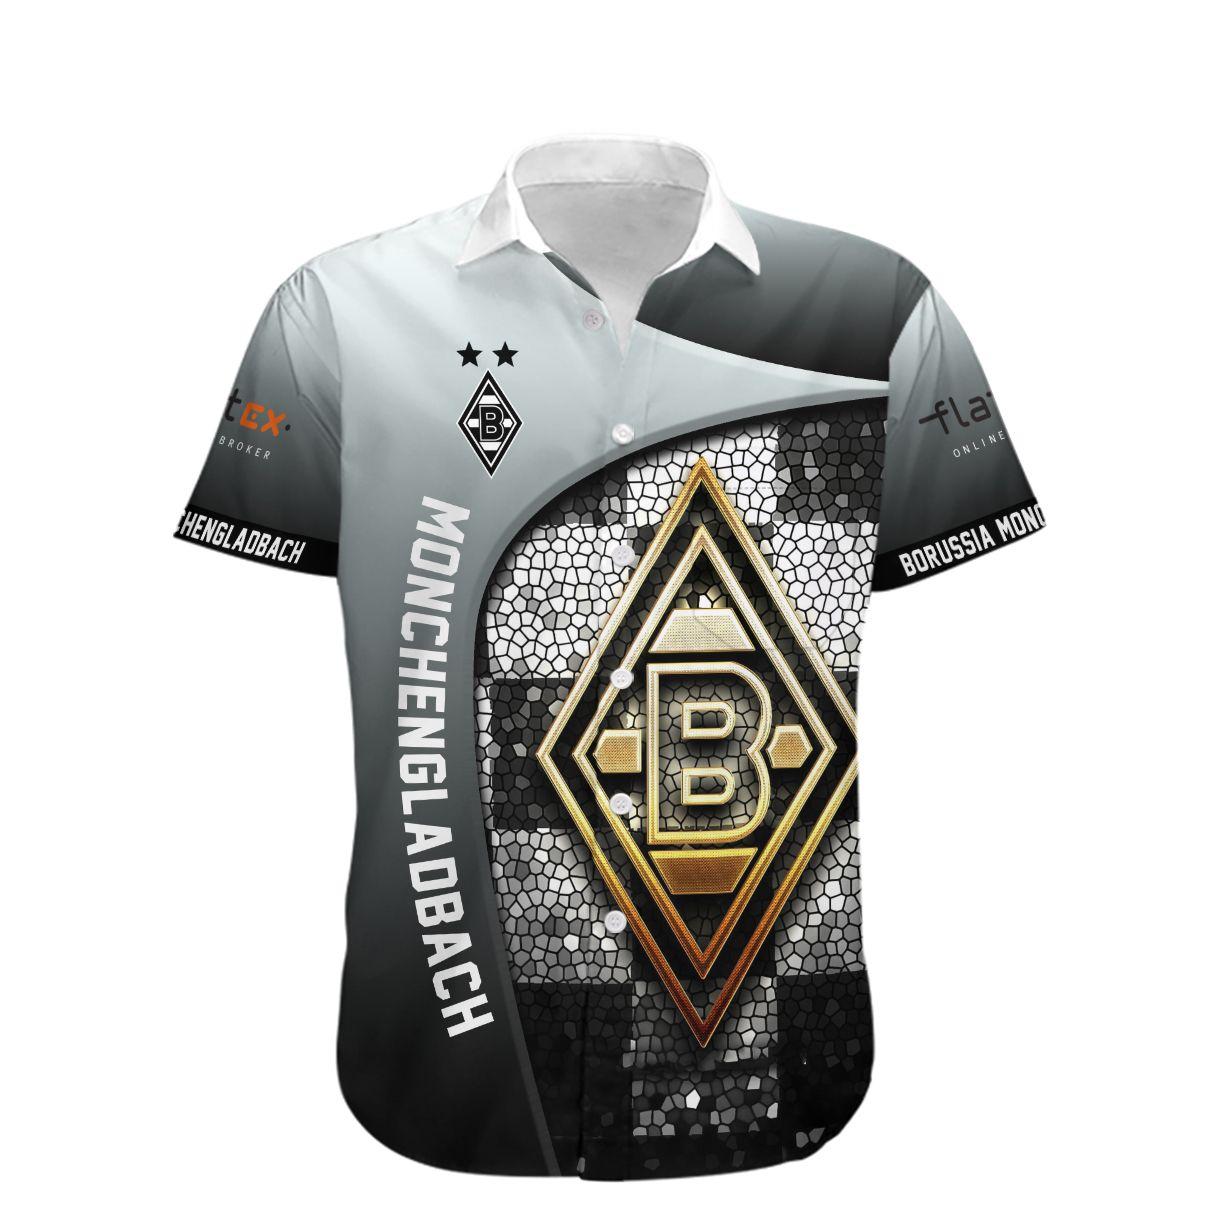 Borussia Monchengladbach Die Fohlen Hawaiian Shirt